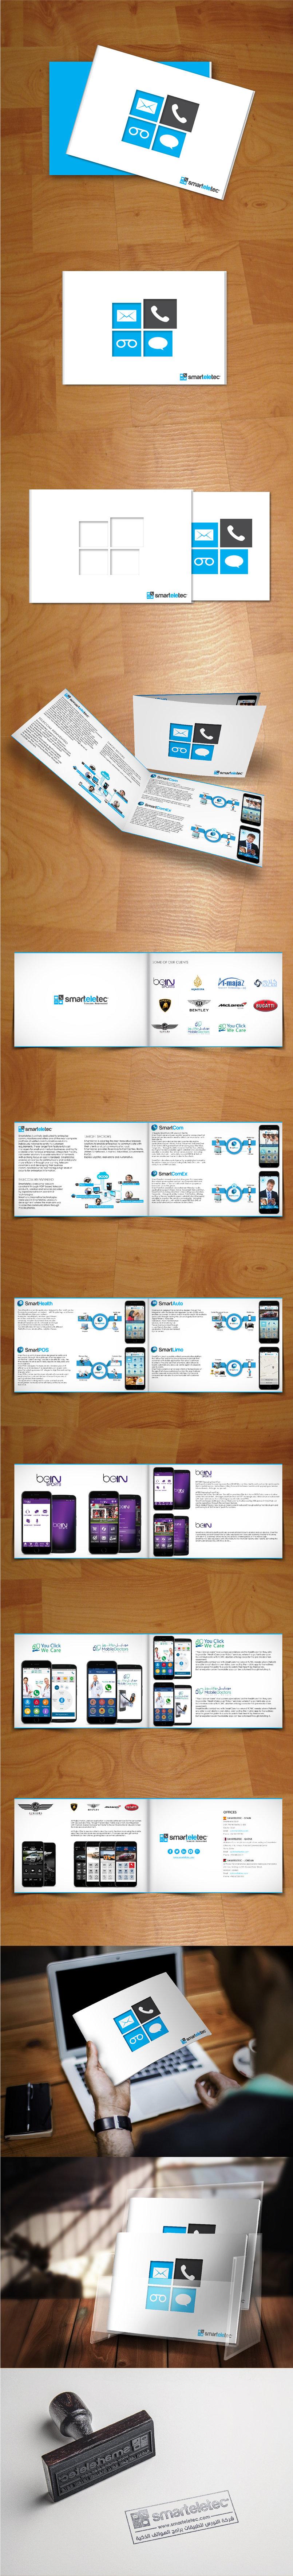 Smarteletec I Company Profile